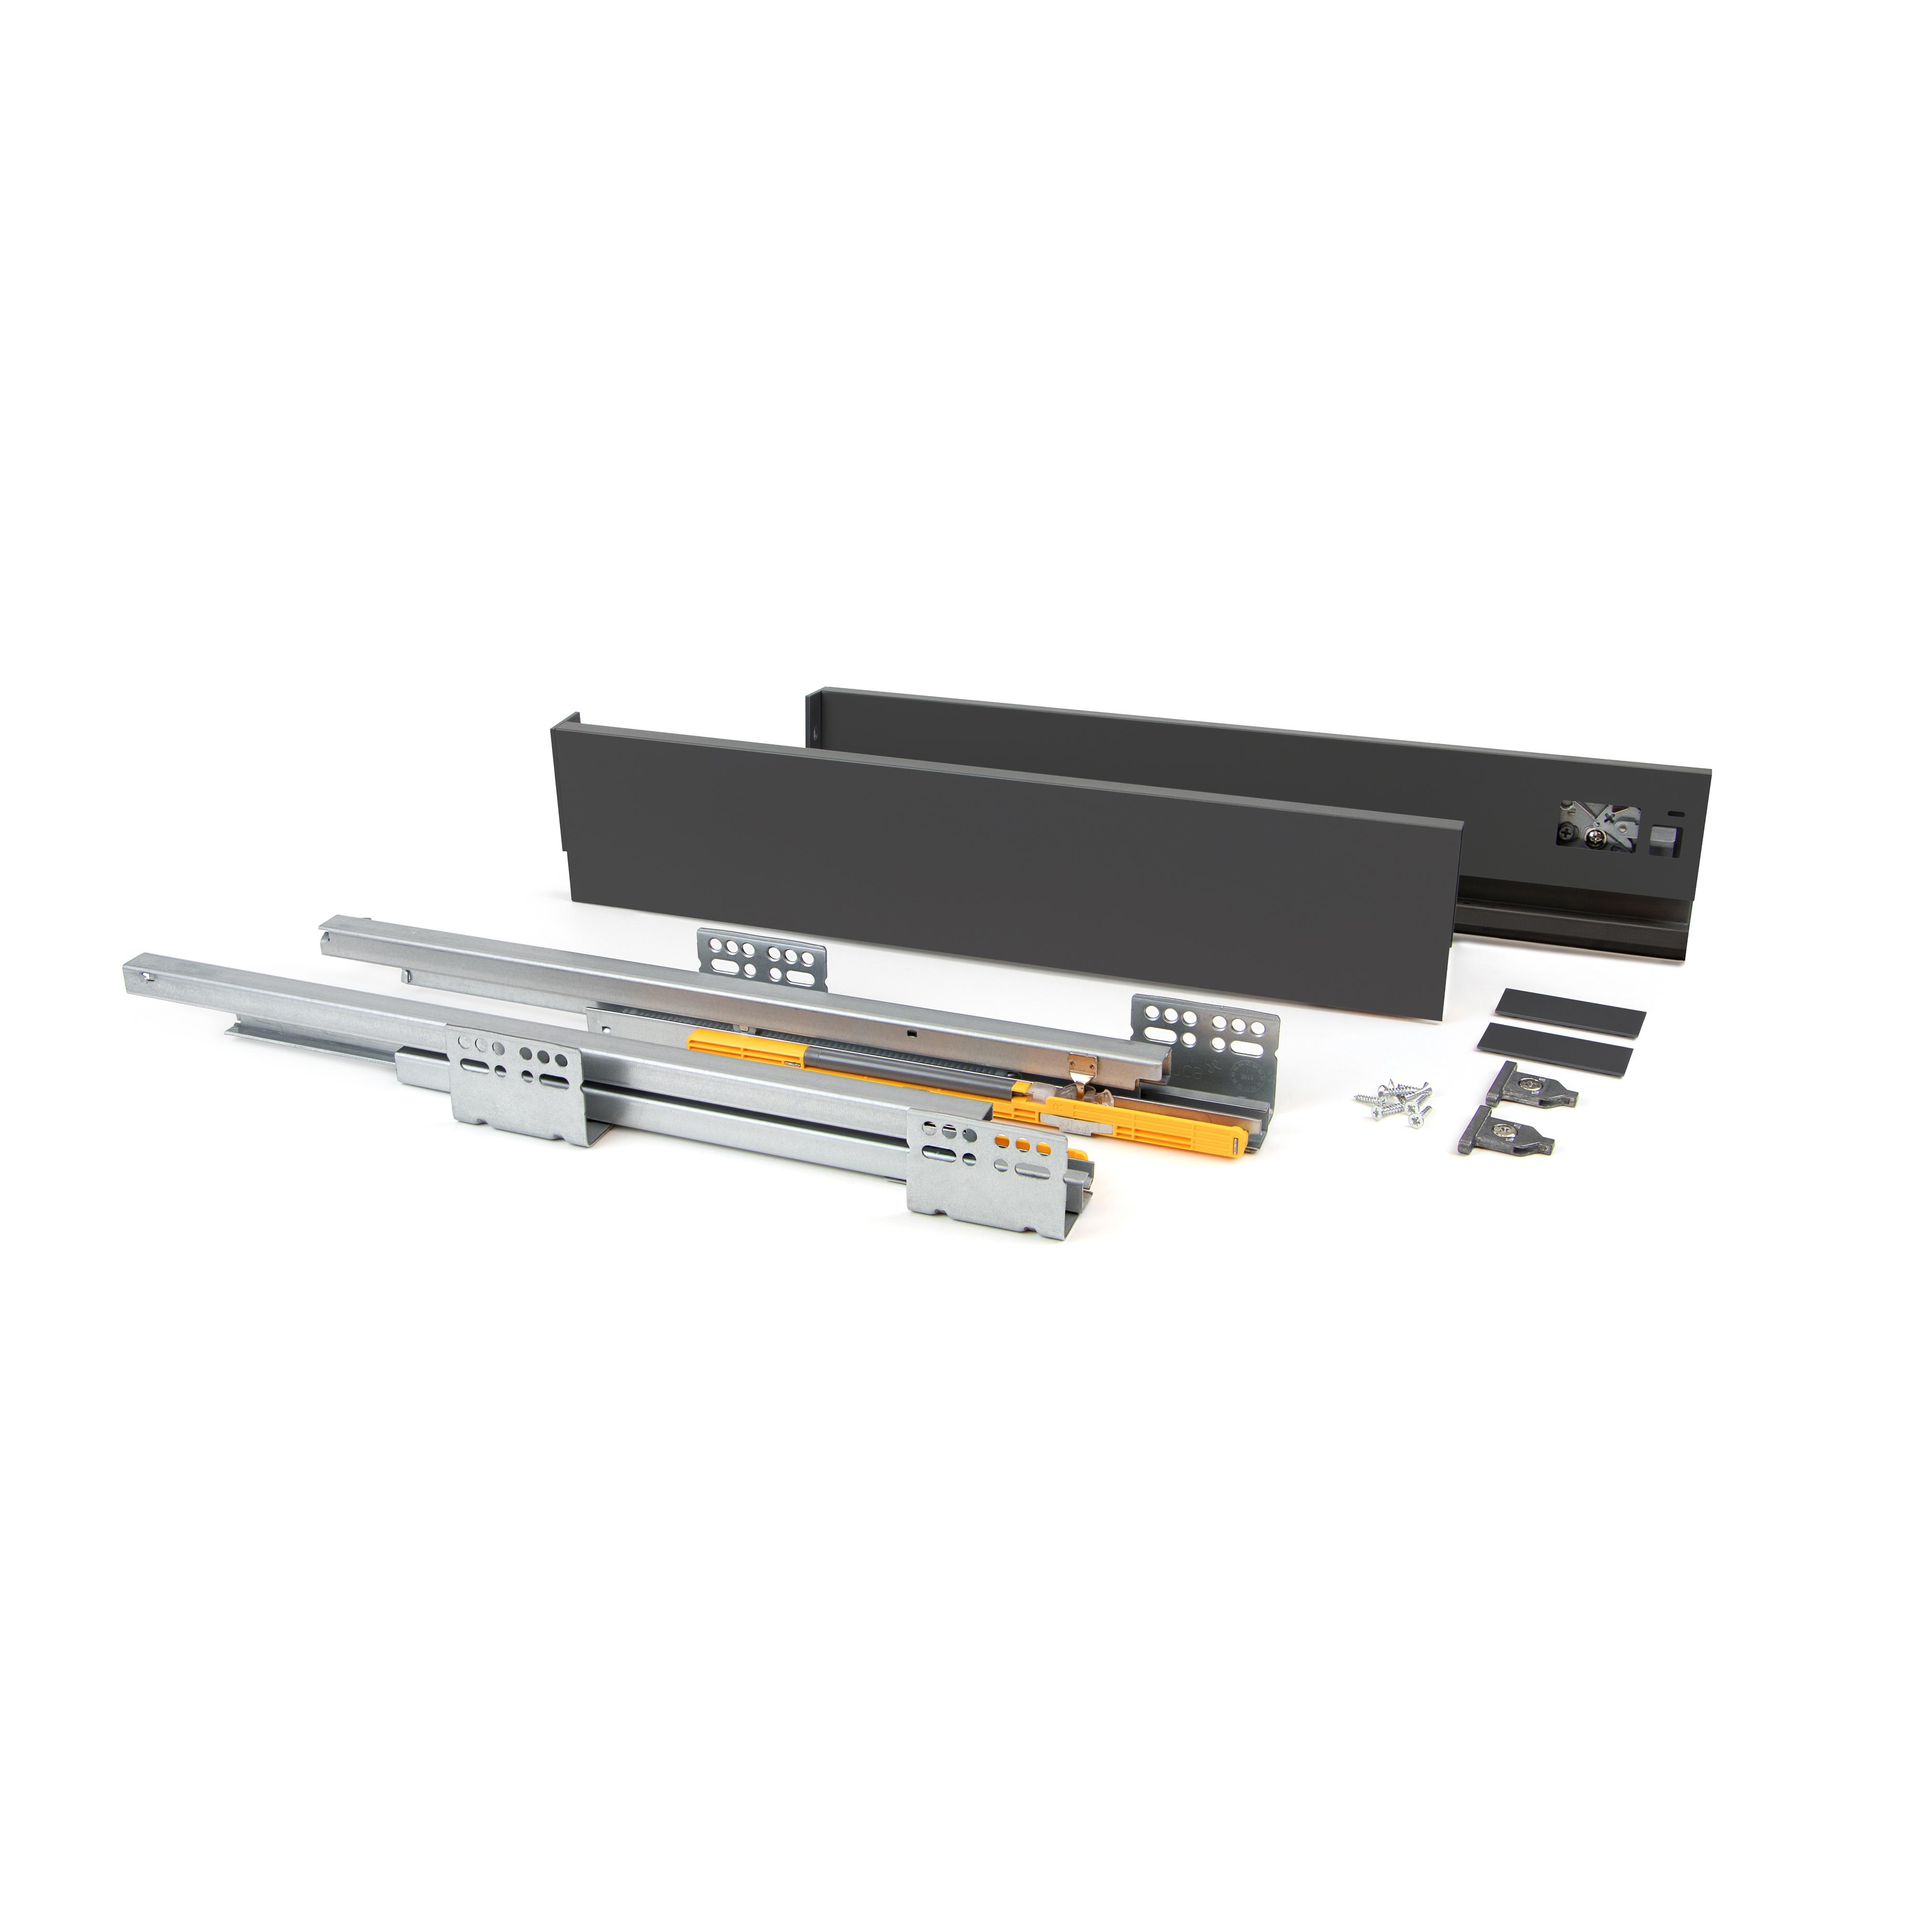 Emuca Kit cassetto per cucina Concept, altezza 138 mm, prof. 350 mm, chiusura soft, Acciaio, Bianco